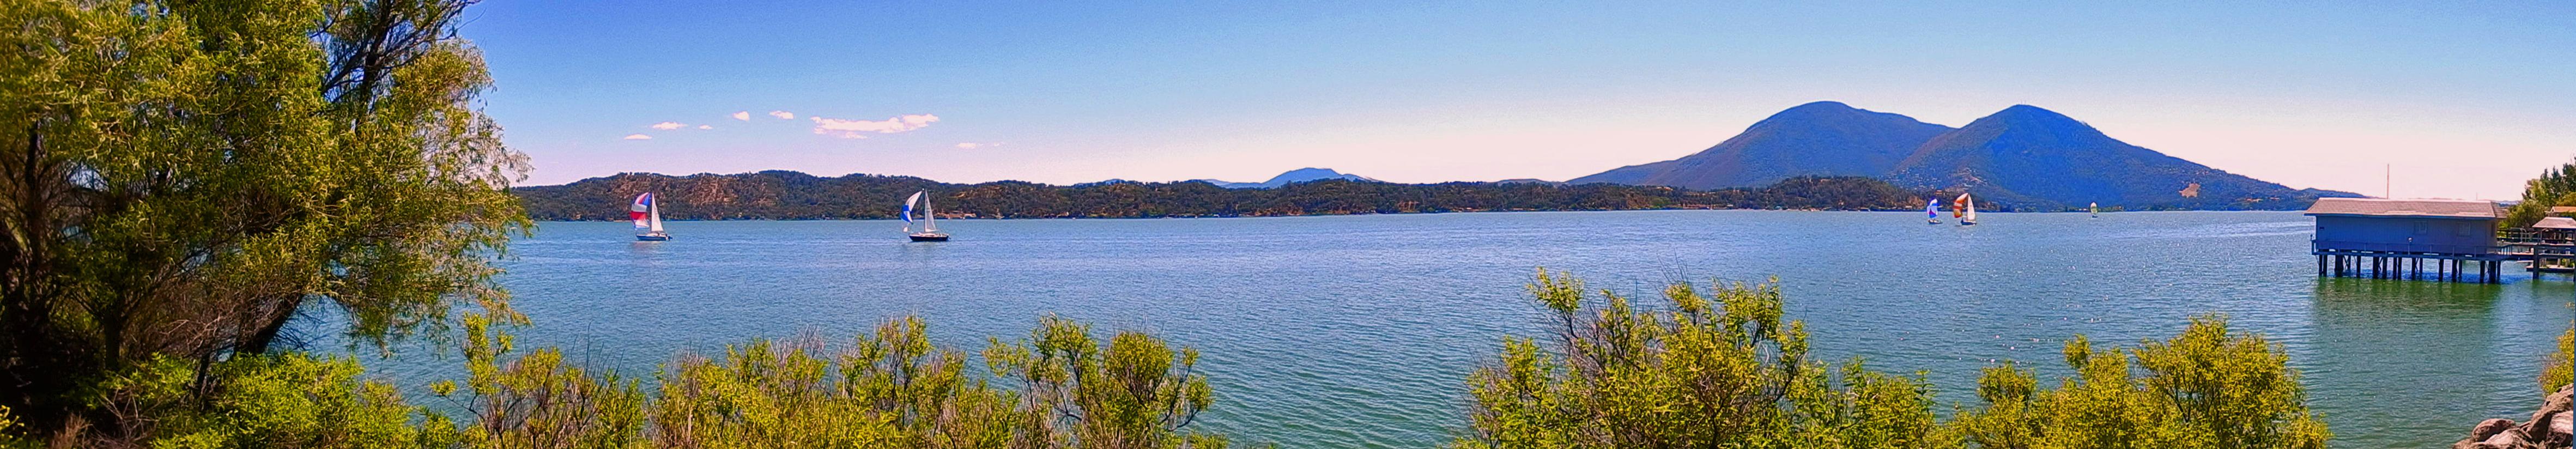 lake county, california